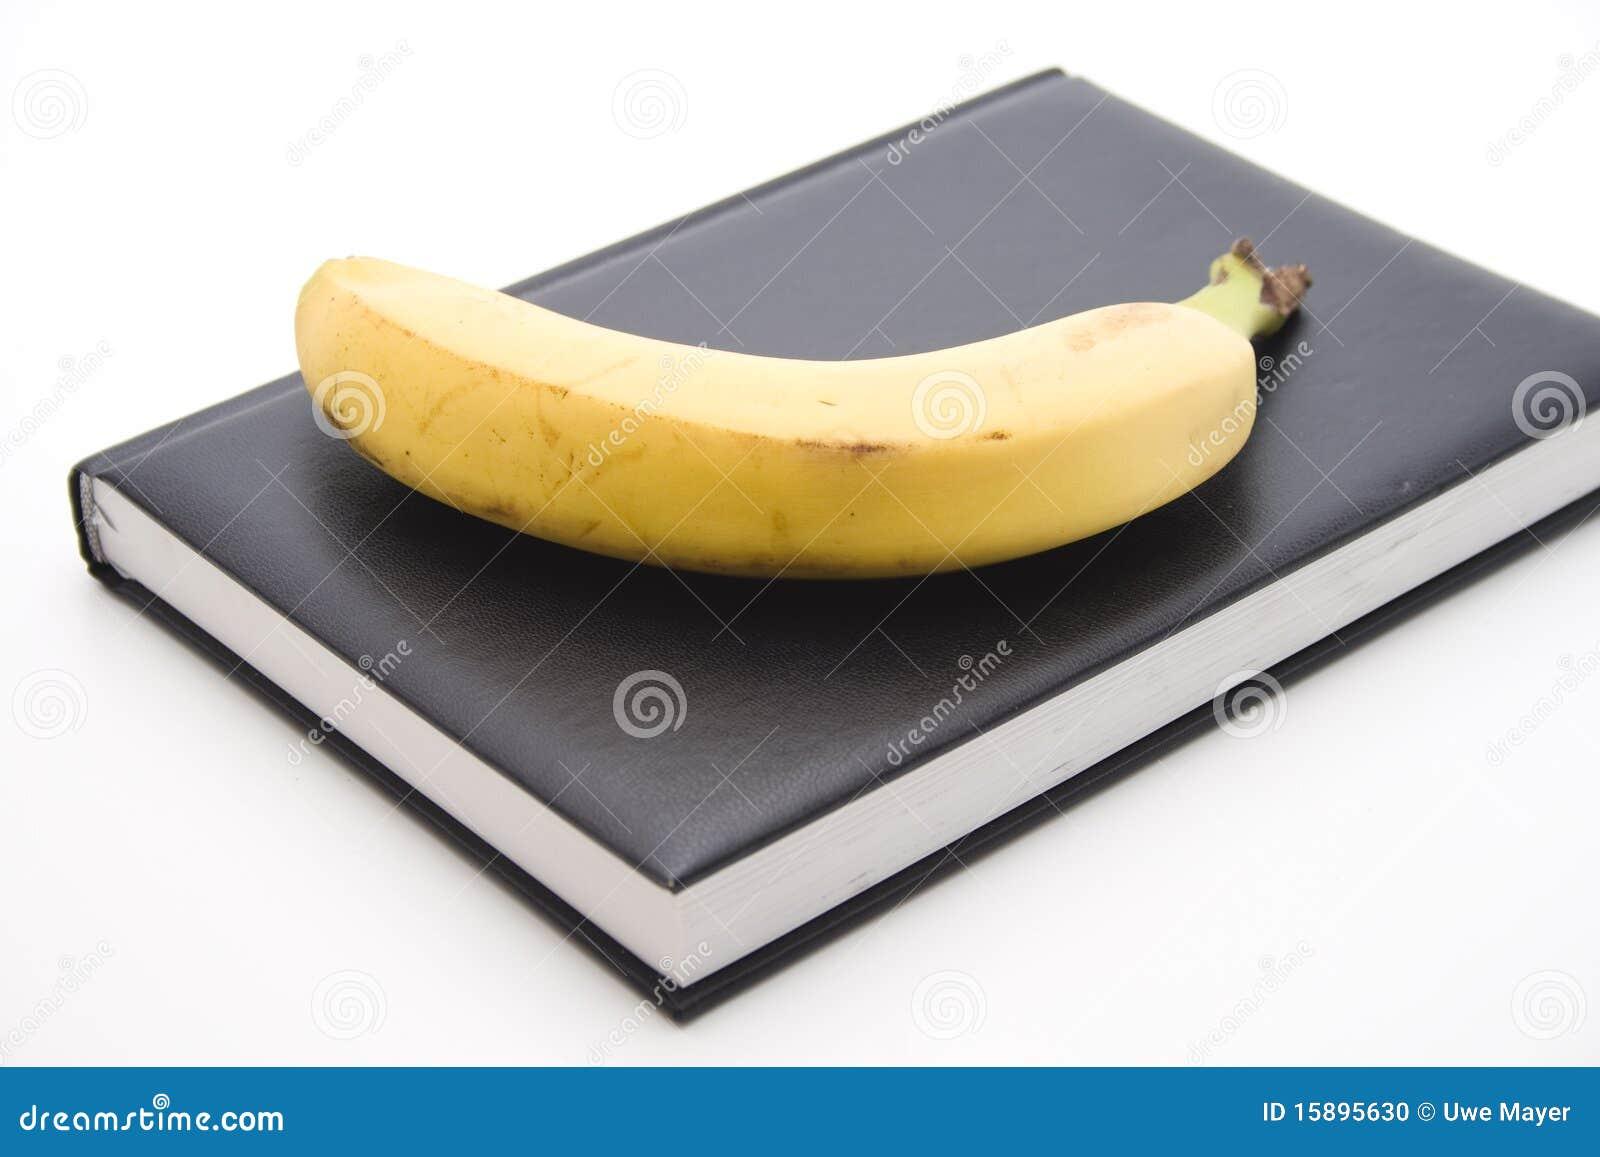 Banana Onto Book Stock Photo - Image: 15895630